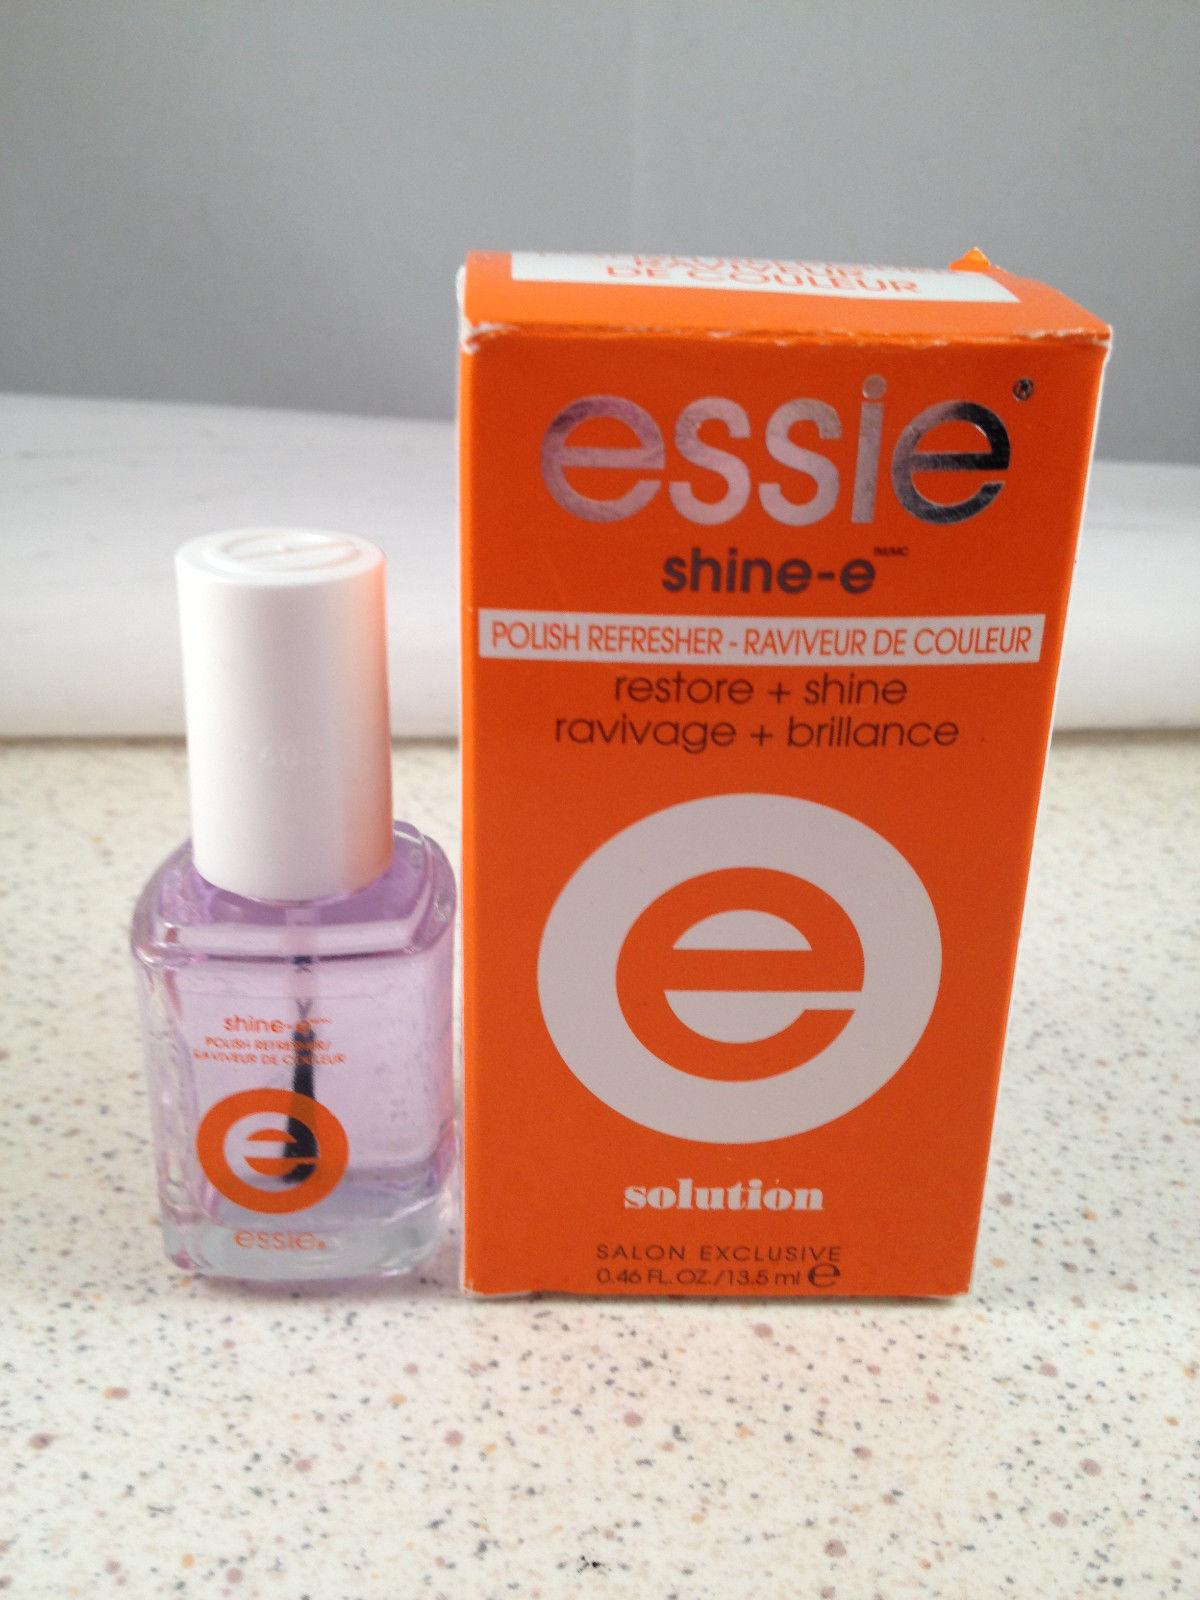 Essie Shine-e Polish Refresher Nail Lacquer Color clear top coat treatment